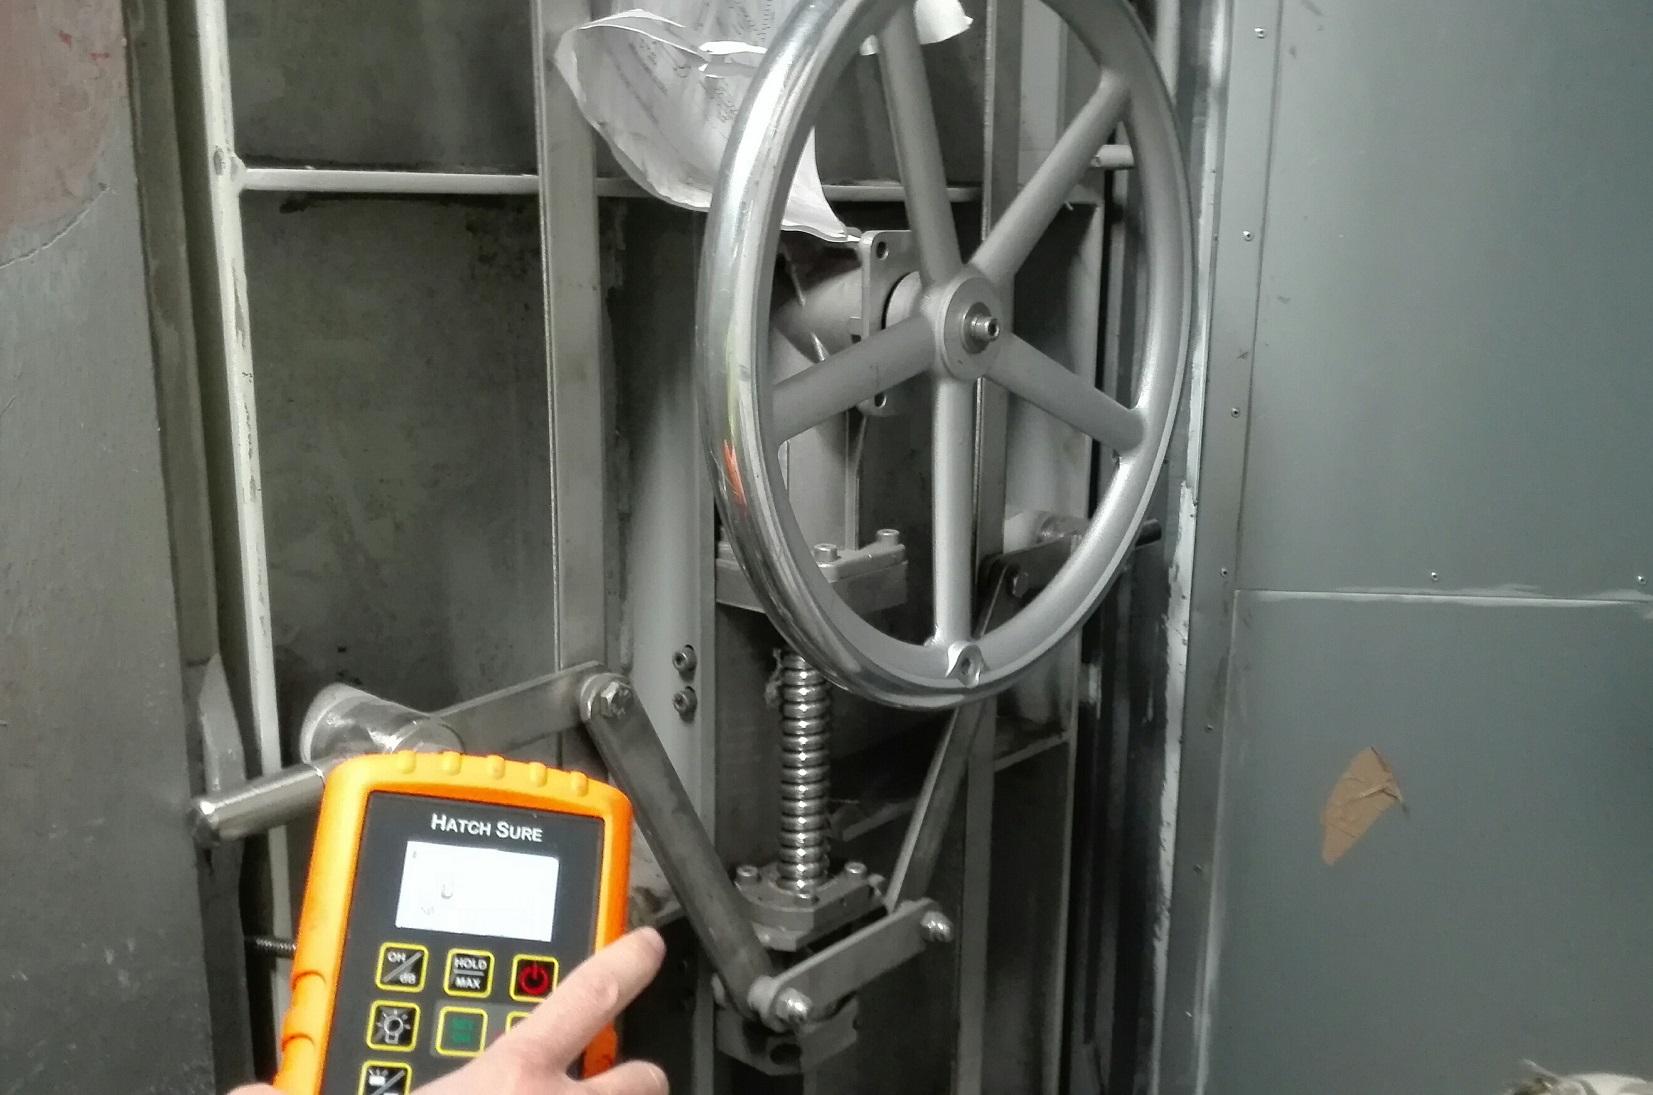 ultrasonic-test-watertight-doors-comissioning-spain-cadiz-gibraltar-vigo-castropol-drydock-shipyard